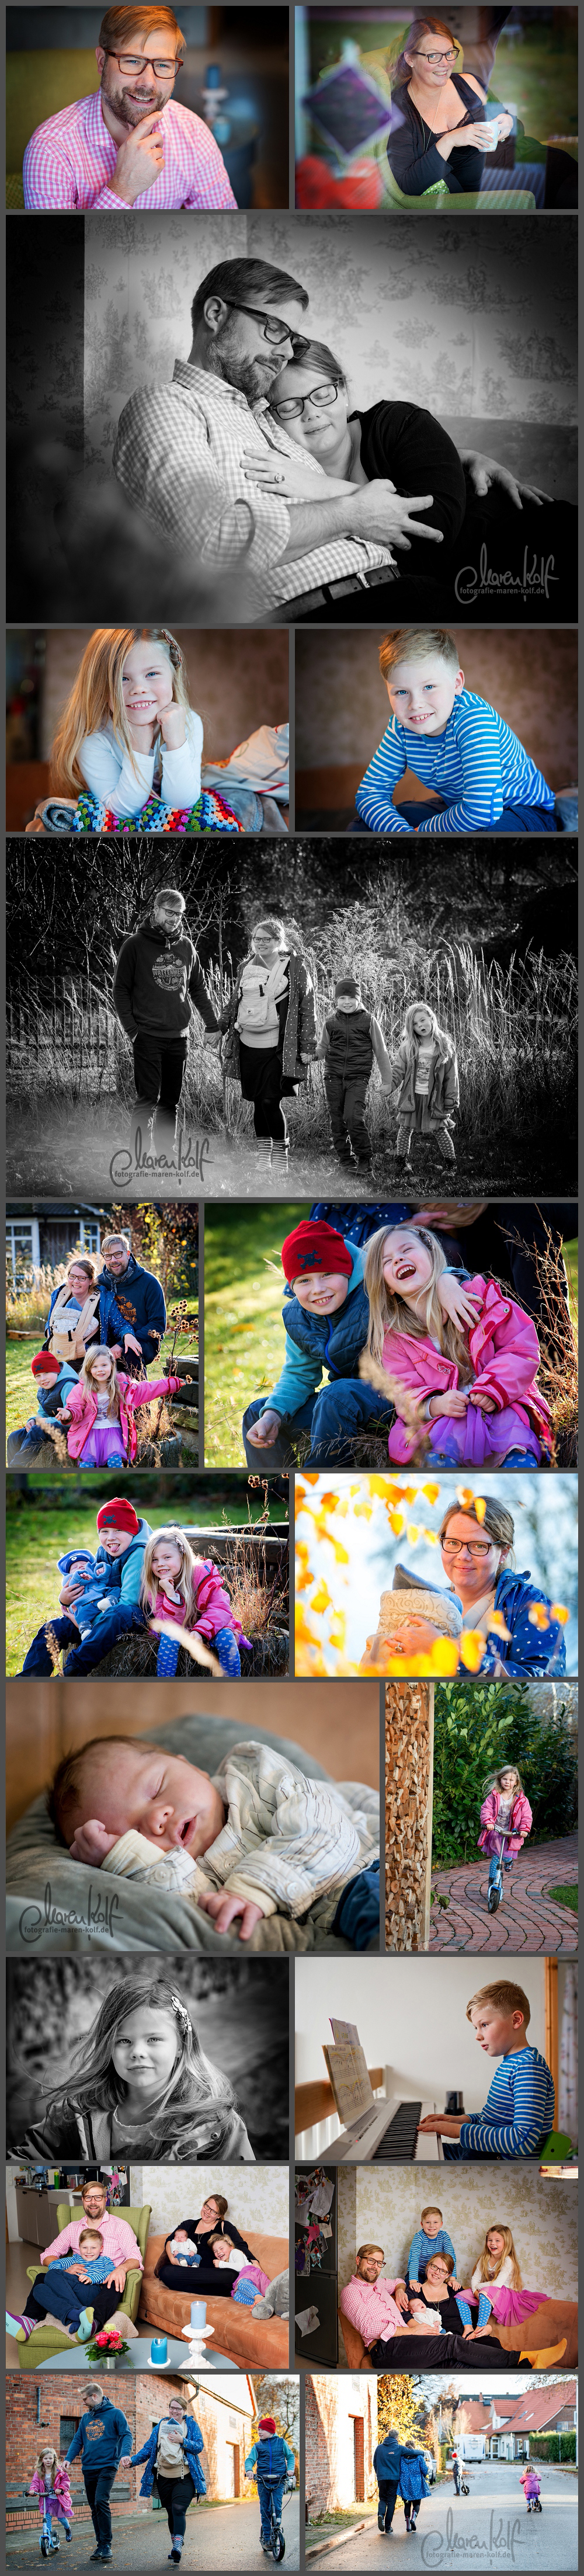 homestory-familienfotos-maren-kolf-fotografie-maren-kolf-fotografie-wedemark